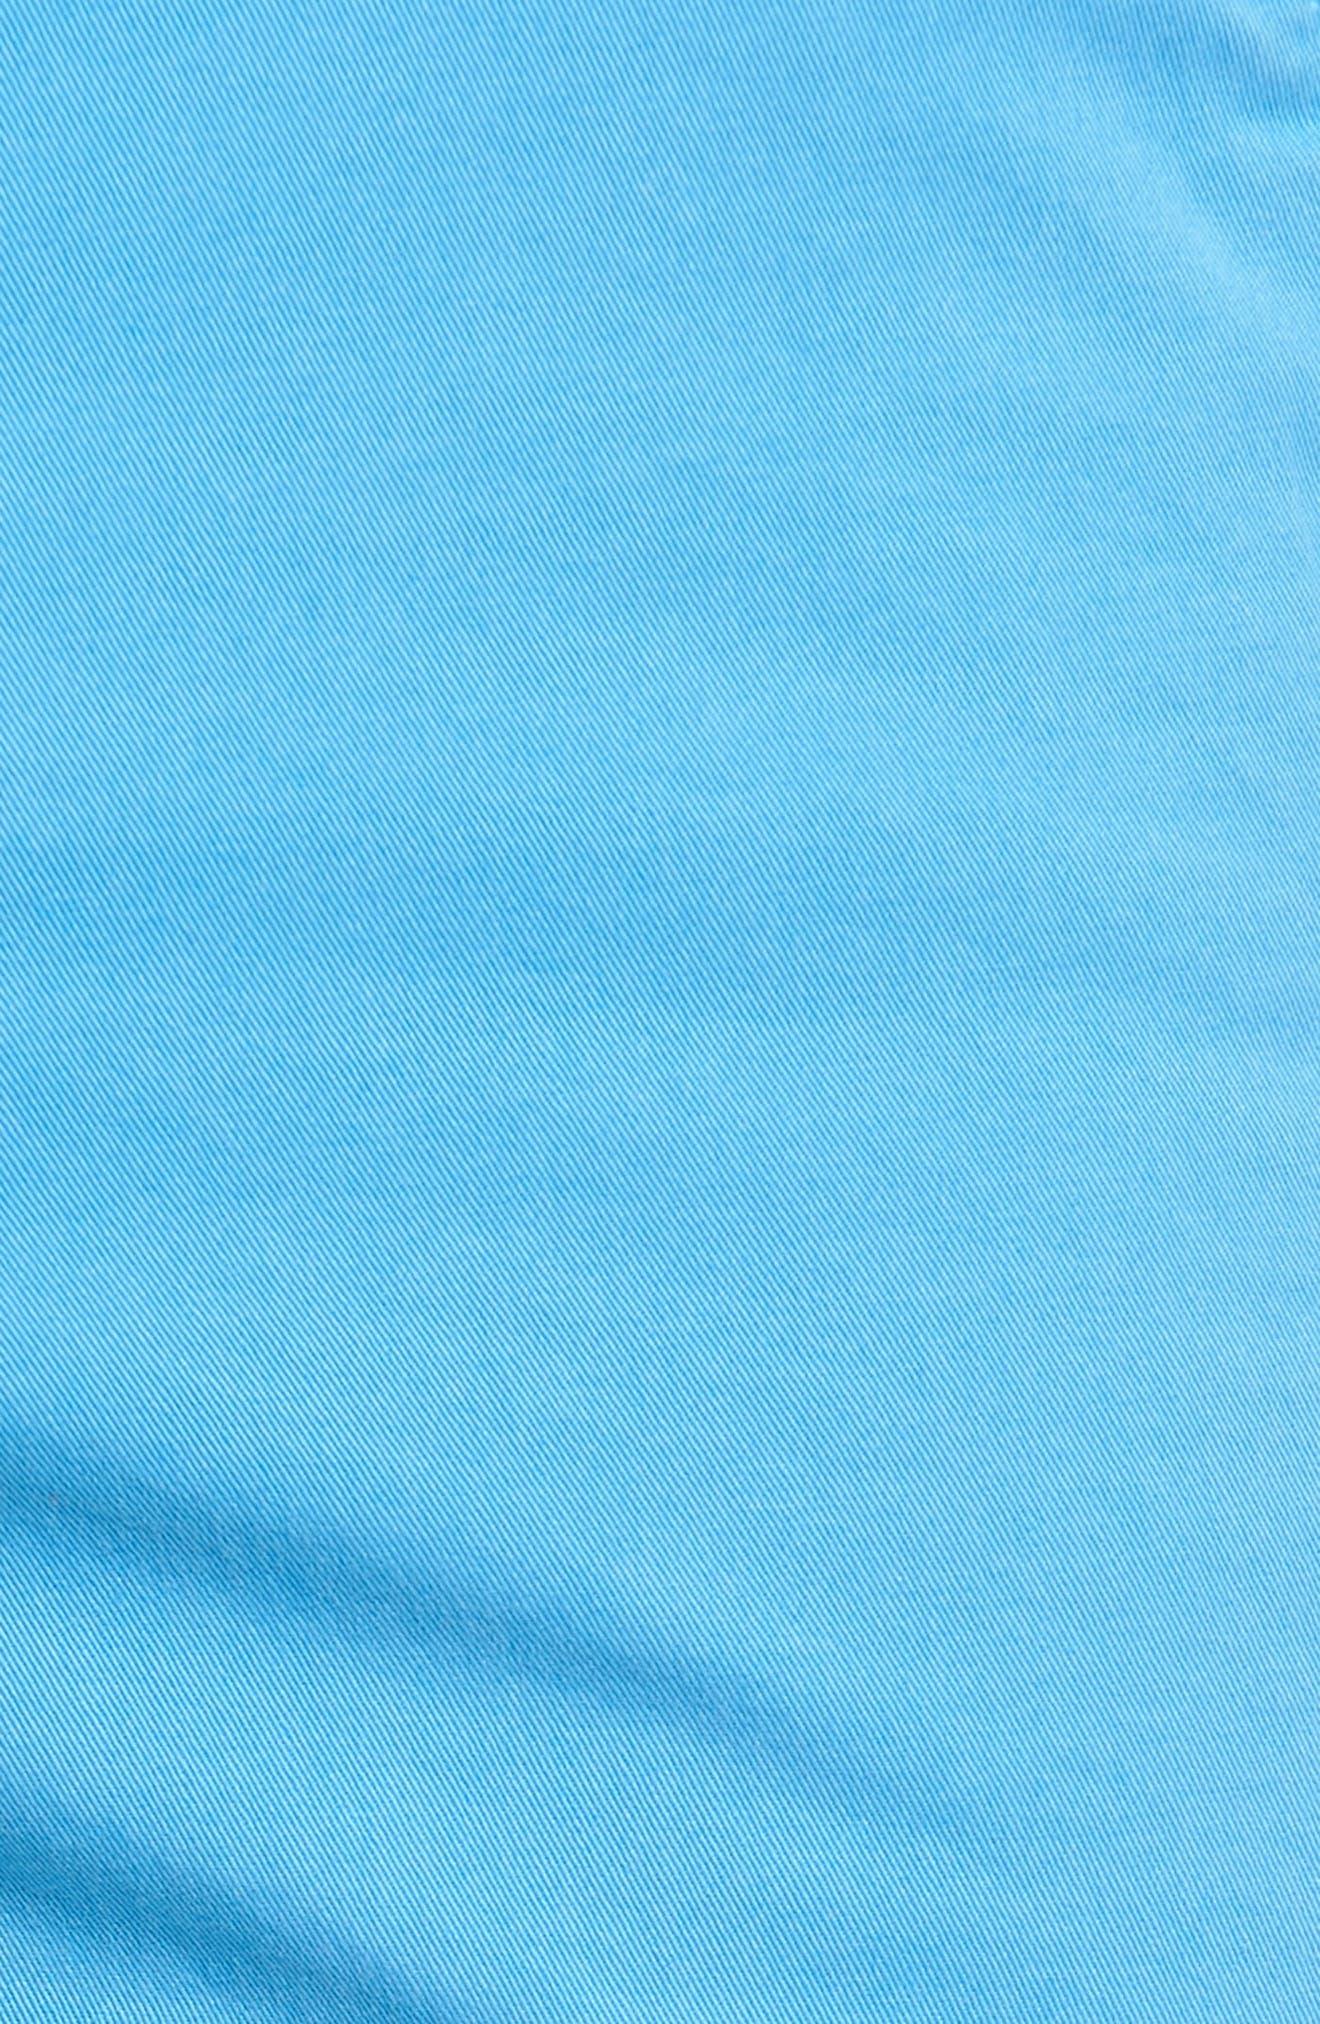 'Sunny' Stretch Chino Shorts,                             Alternate thumbnail 5, color,                             Hurricane